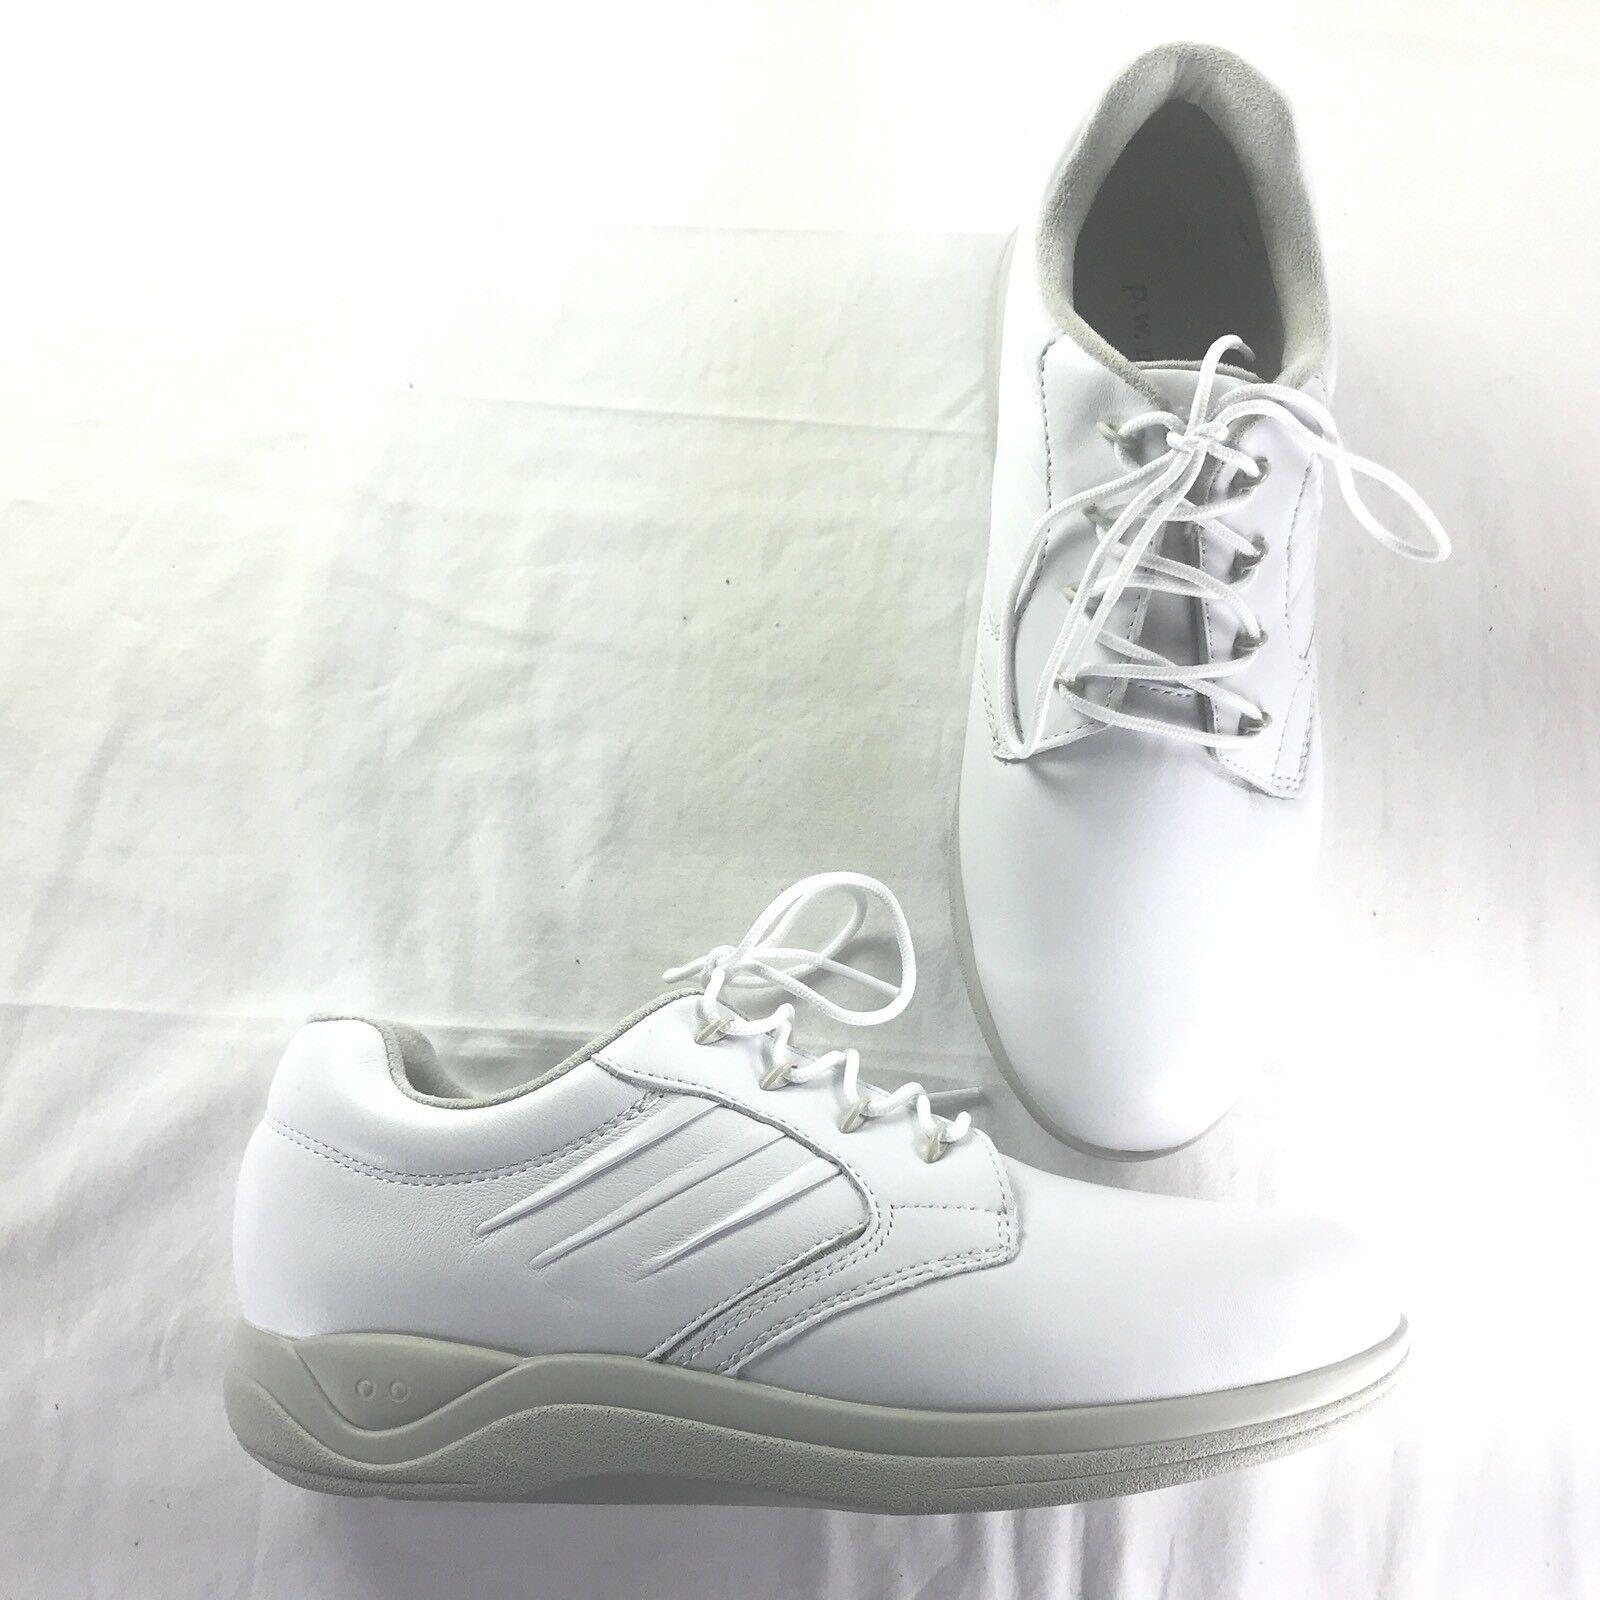 P.W. Minor EMBRACE  Women's Leather shoes White 11.5 B, M